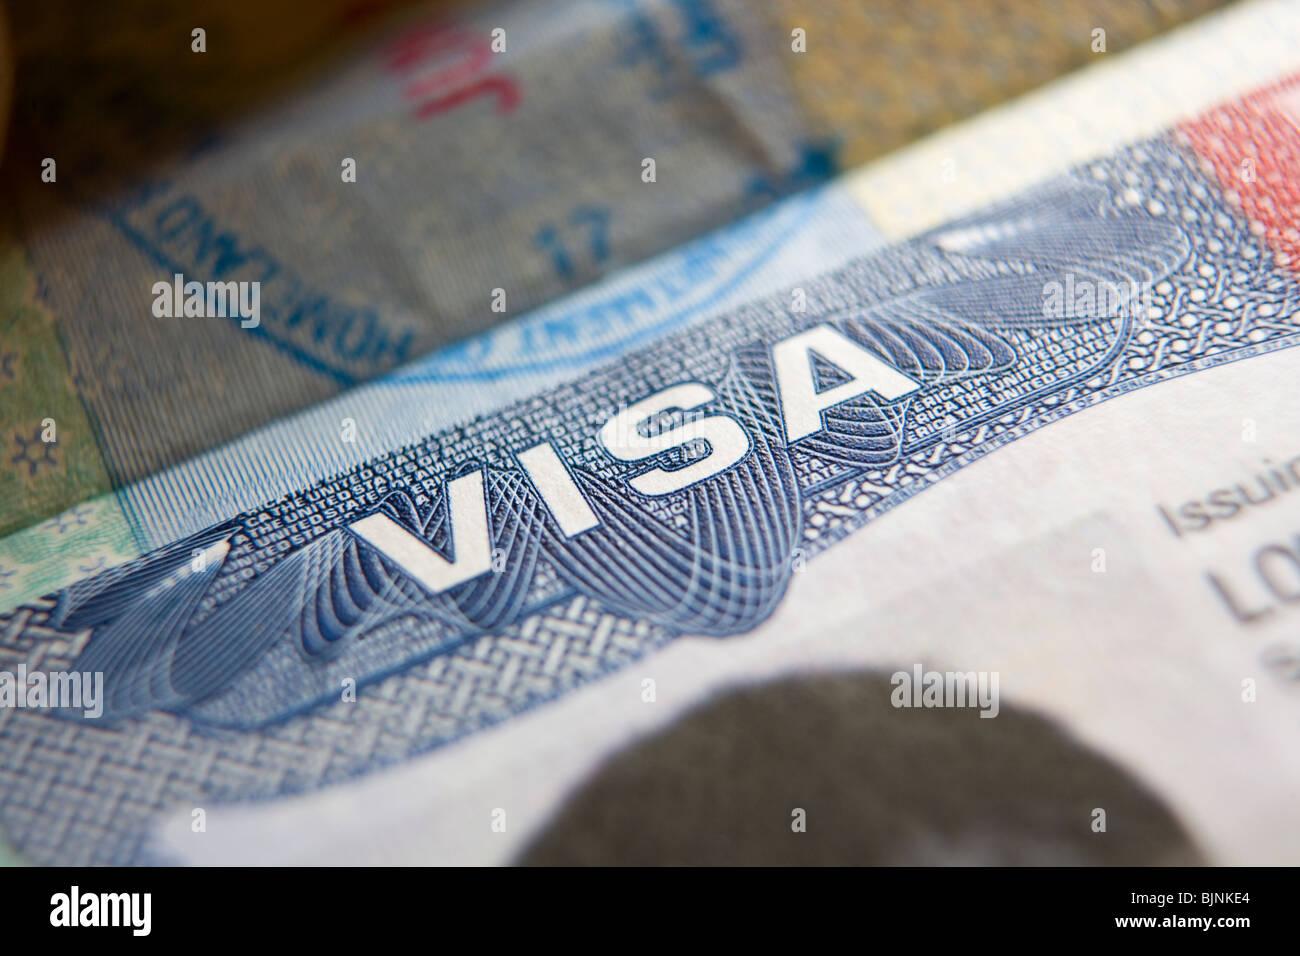 États-unis visa de voyage Photo Stock